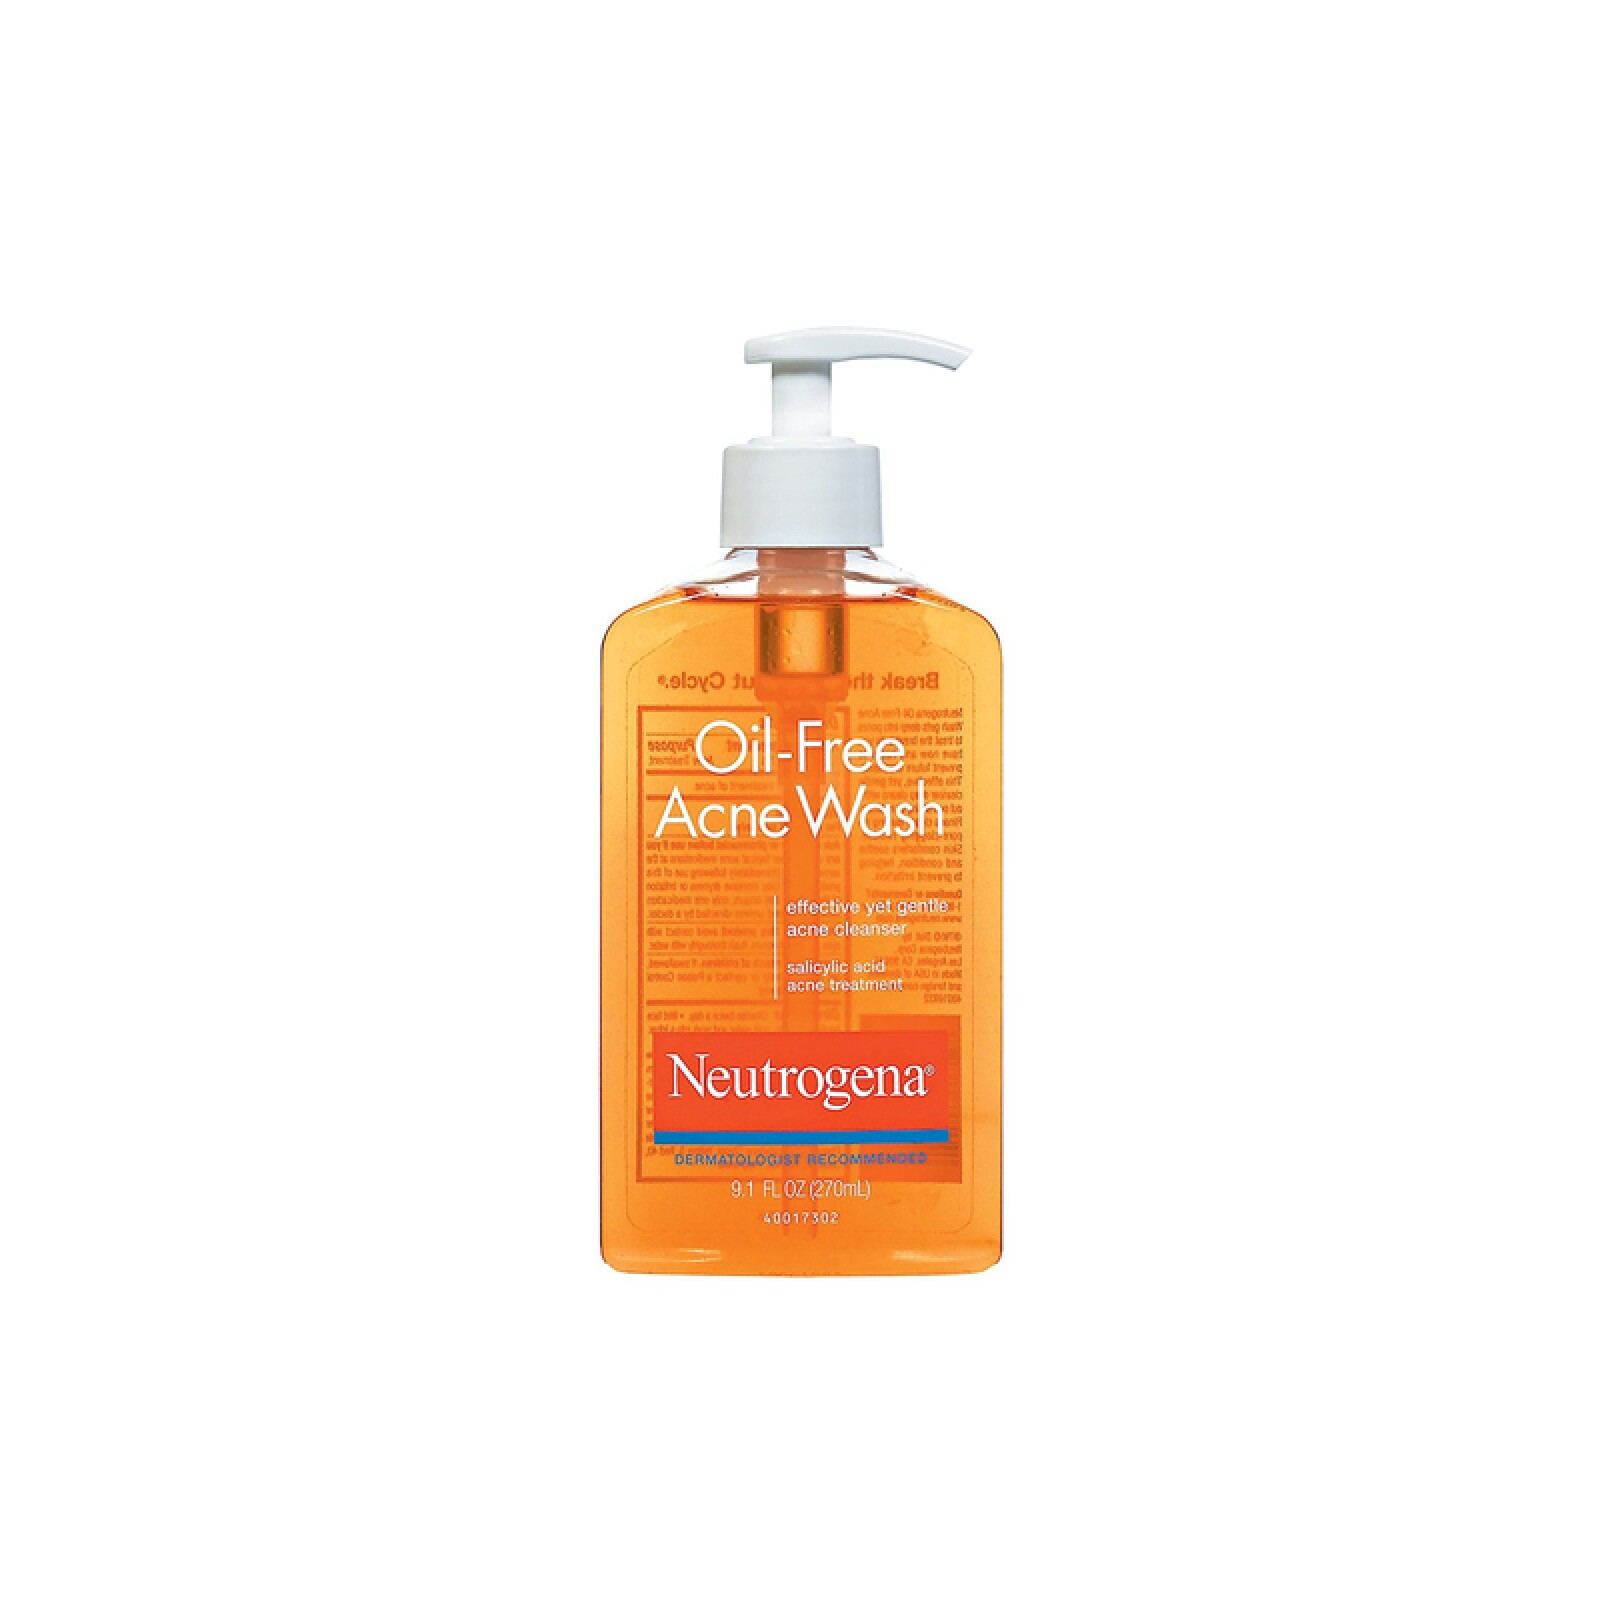 limpiador-cleanser-accesible-barato-skincare-limpieza-neutrogena